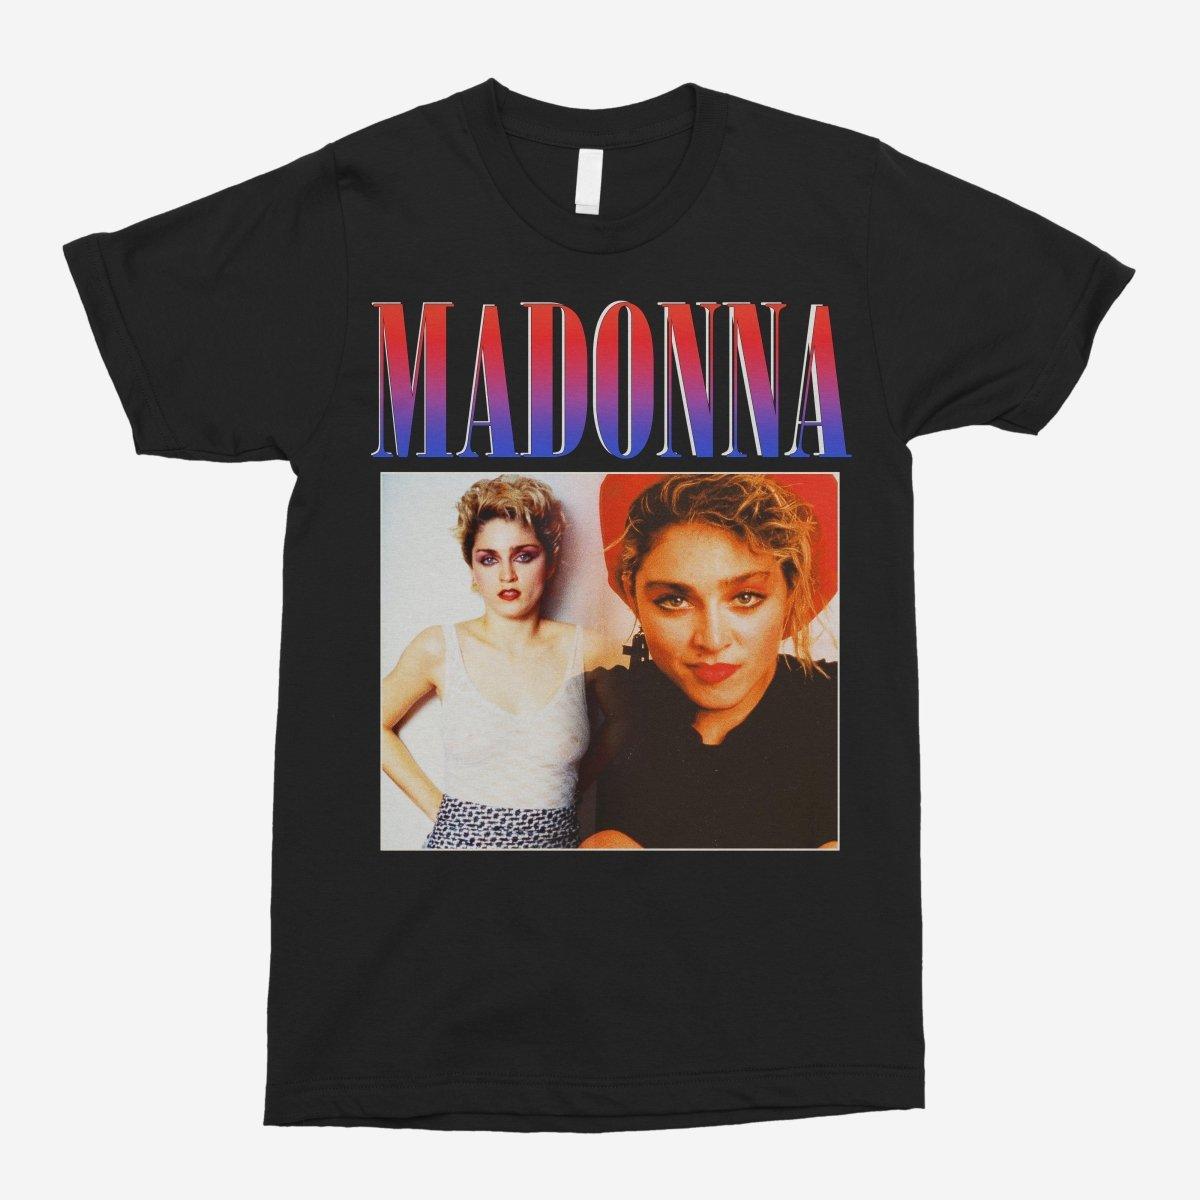 Madonna Vintage Unisex T-Shirt